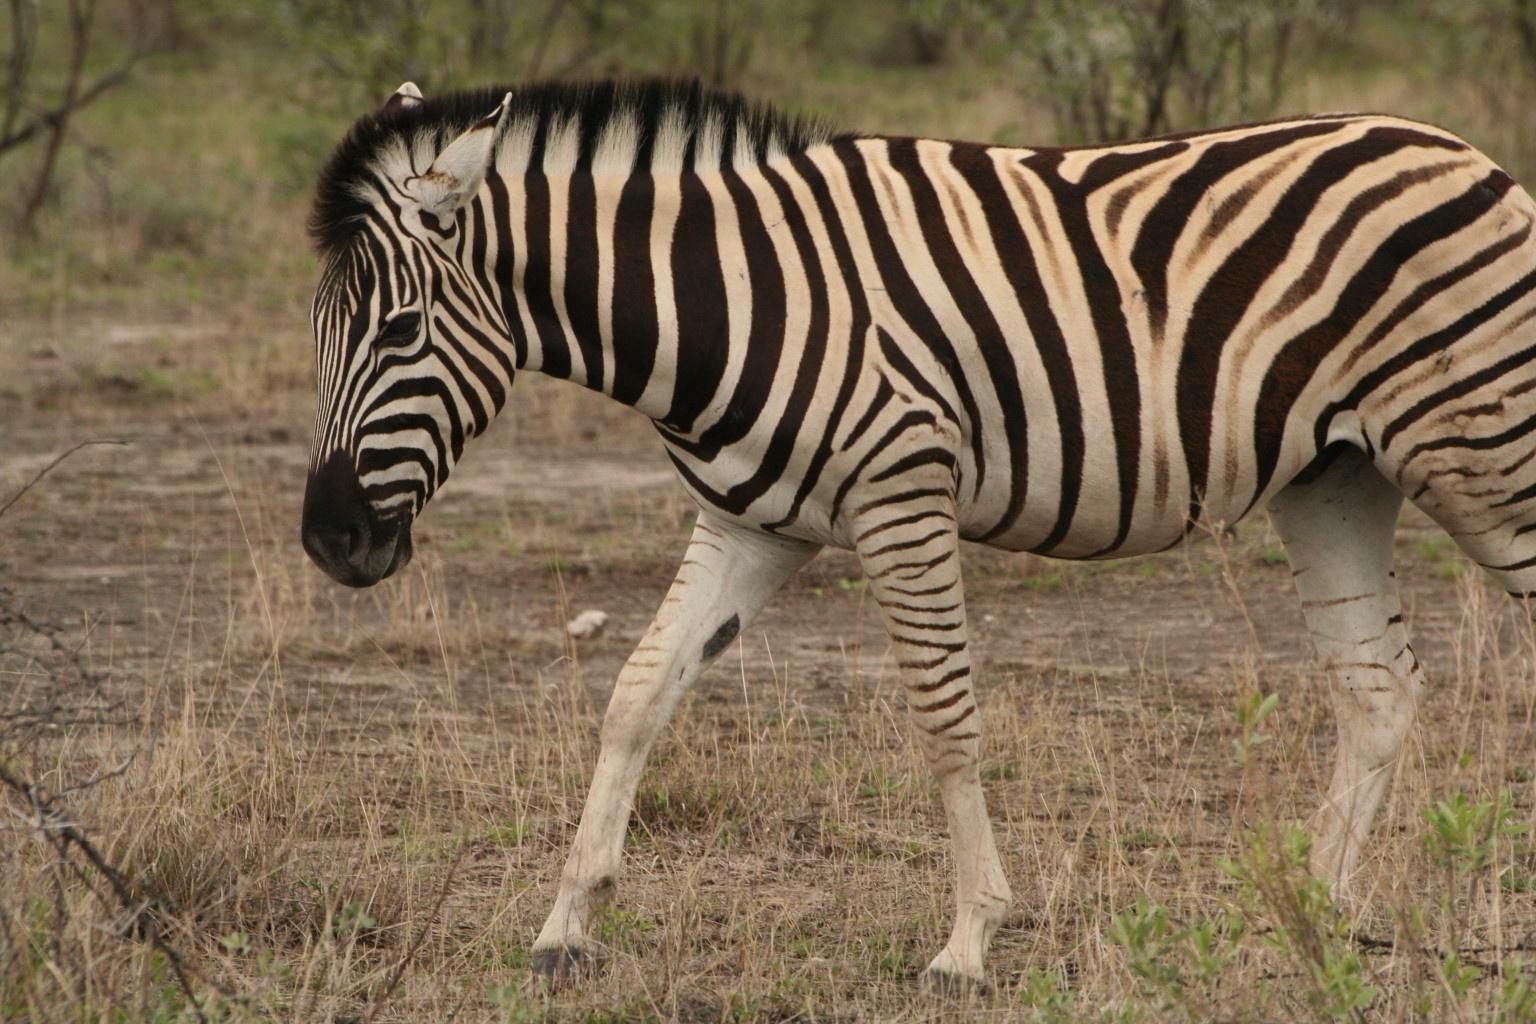 Zebra approach